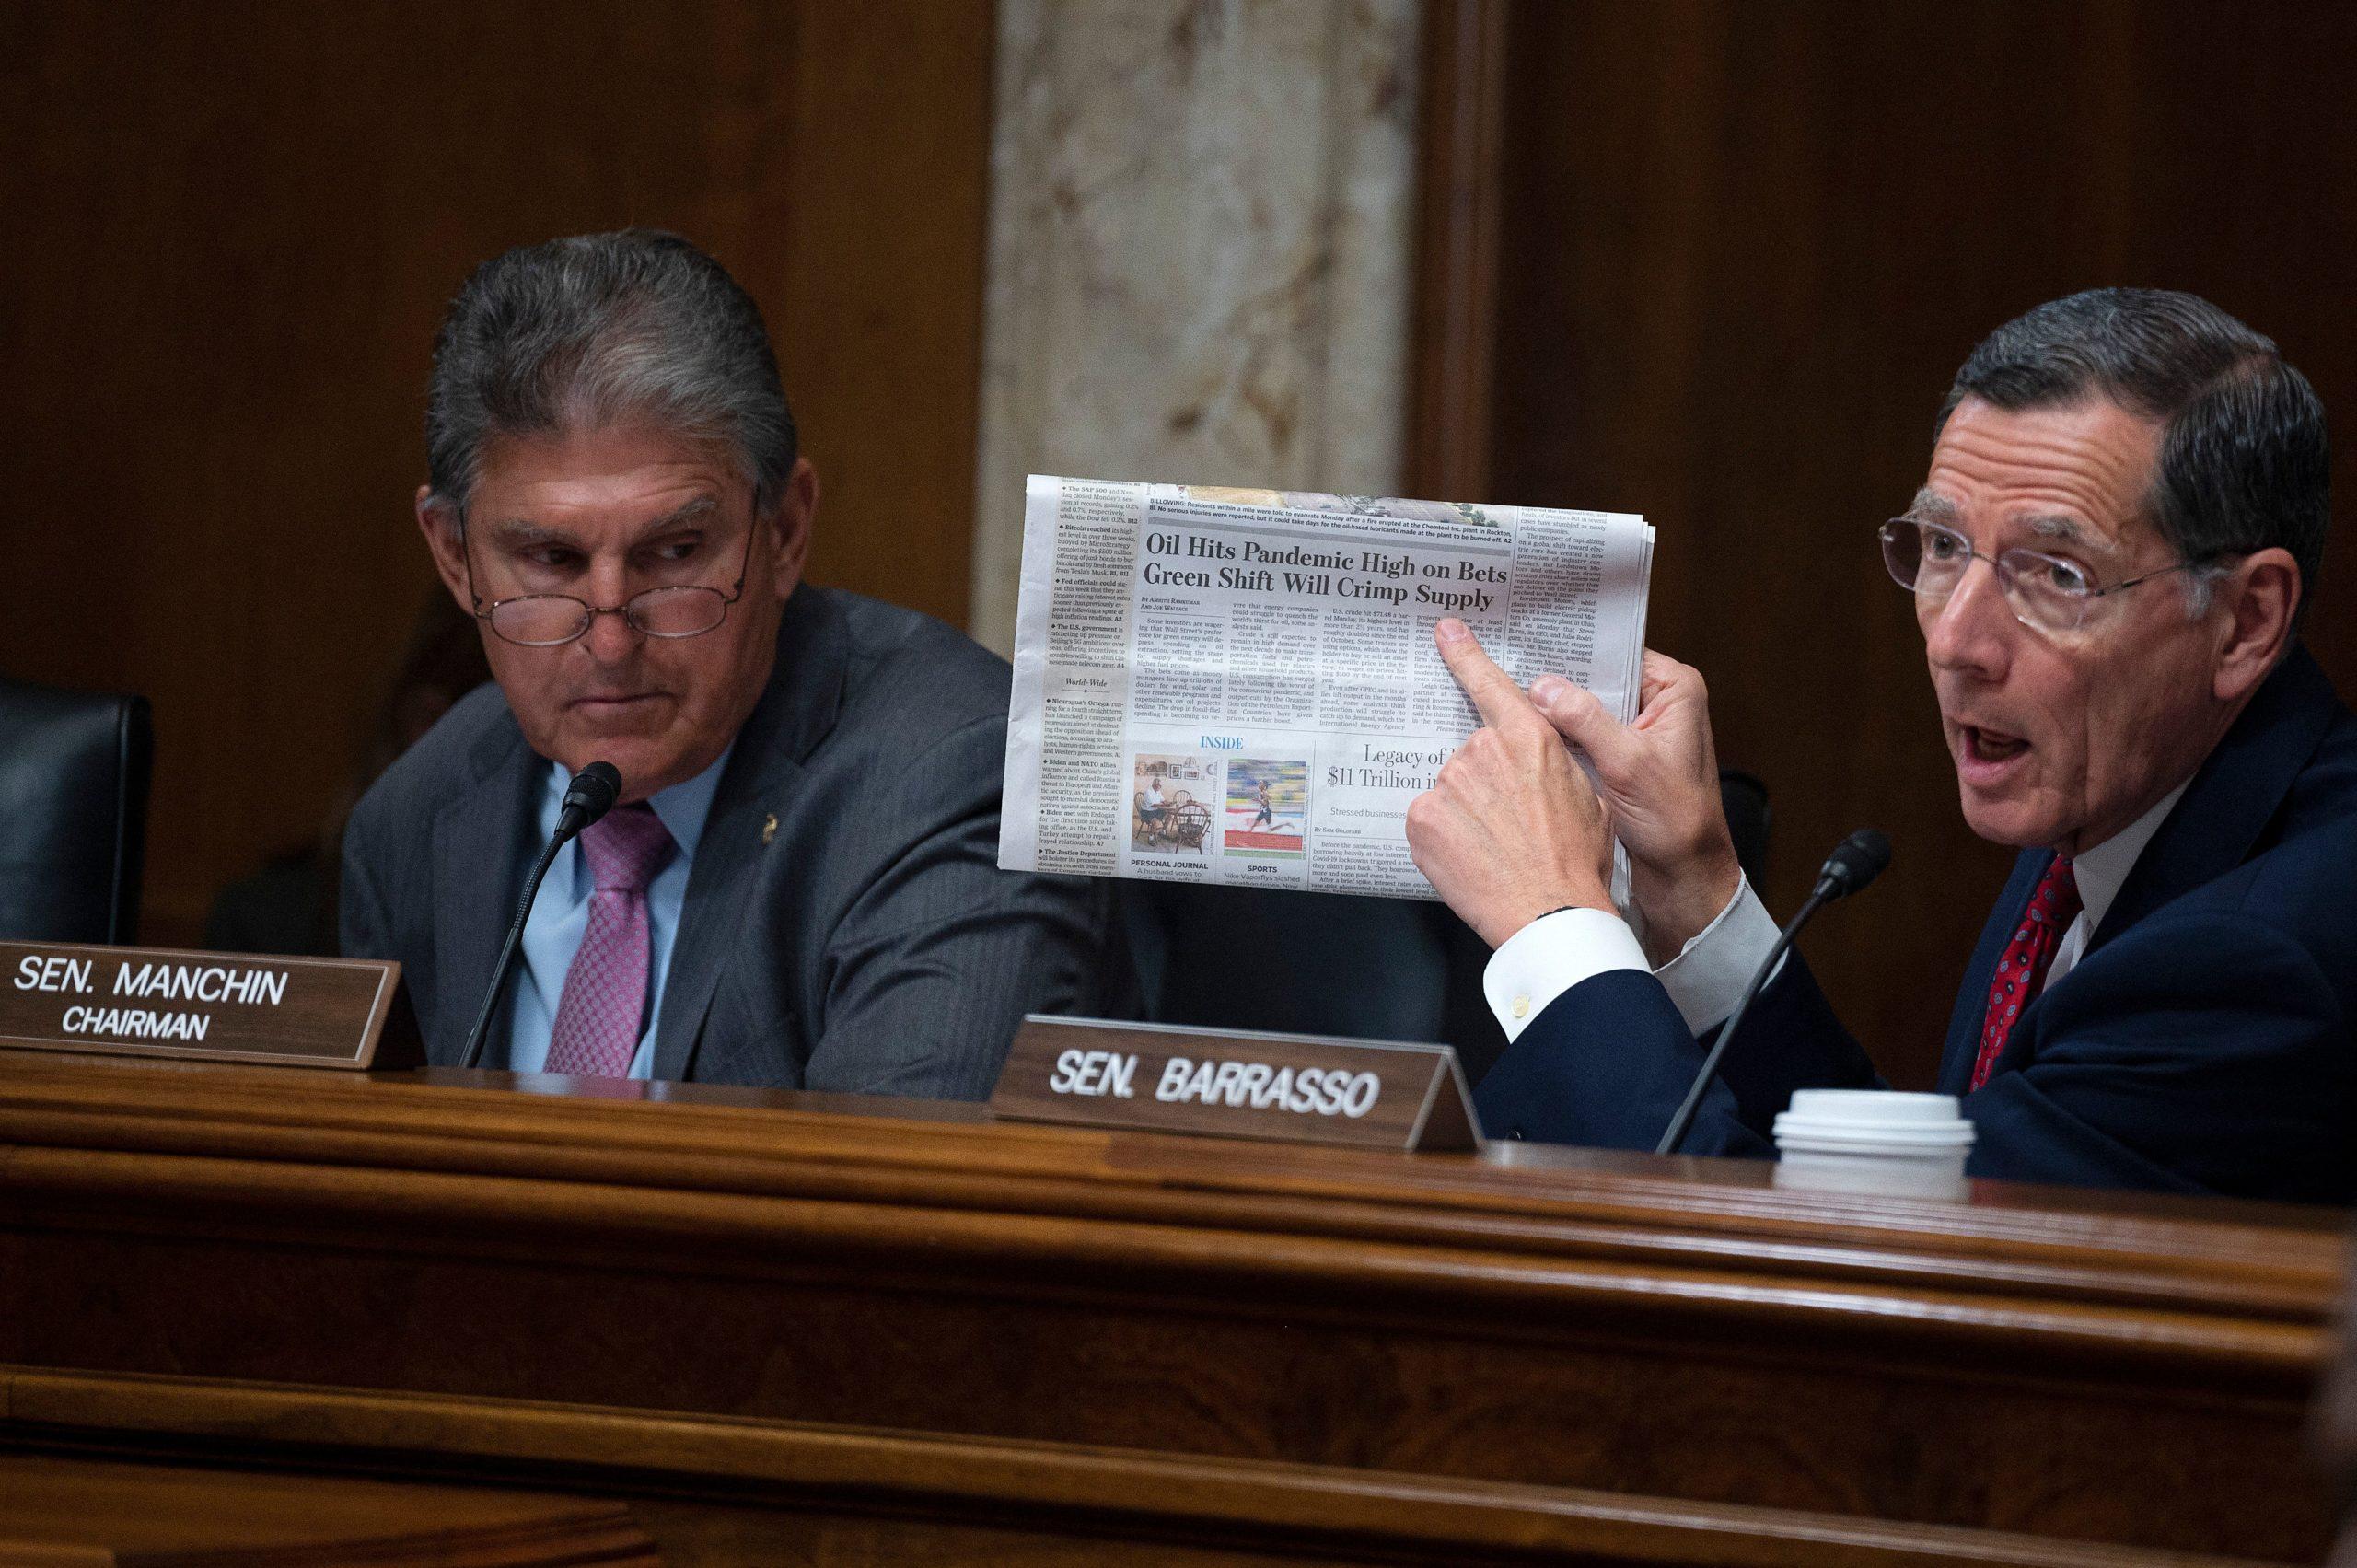 Senate Energy Committee Chairman Joe Manchin looks on as Ranking Member John Barrasso speaks during a hearing on June 15. (Jim Watson/AFP via Getty Images)